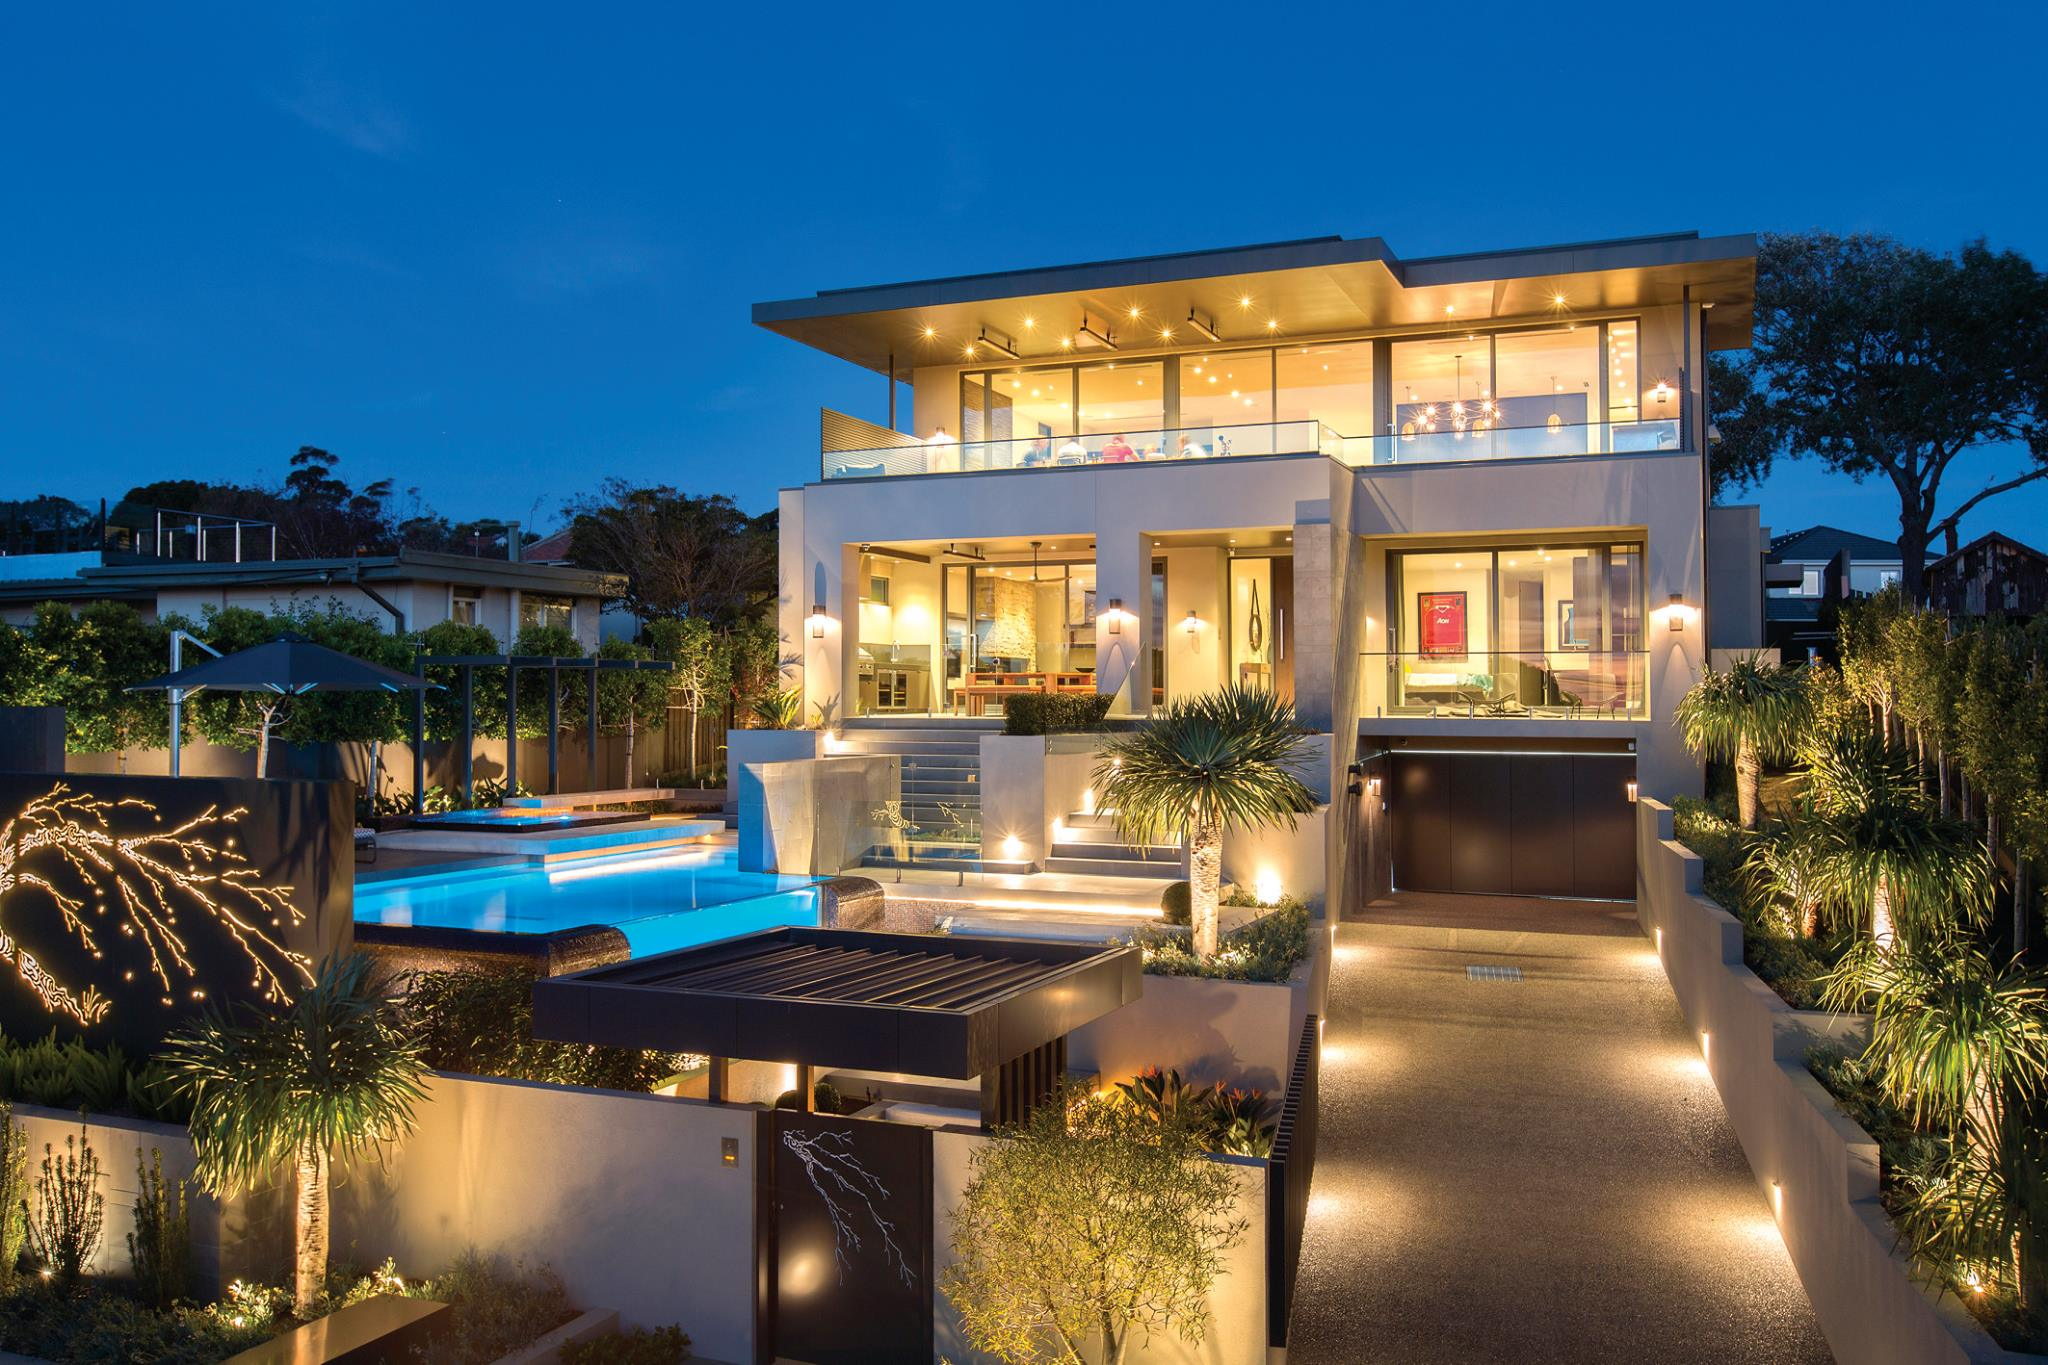 Bayside dream home on Burgess Street by COS Design - CAANdesign